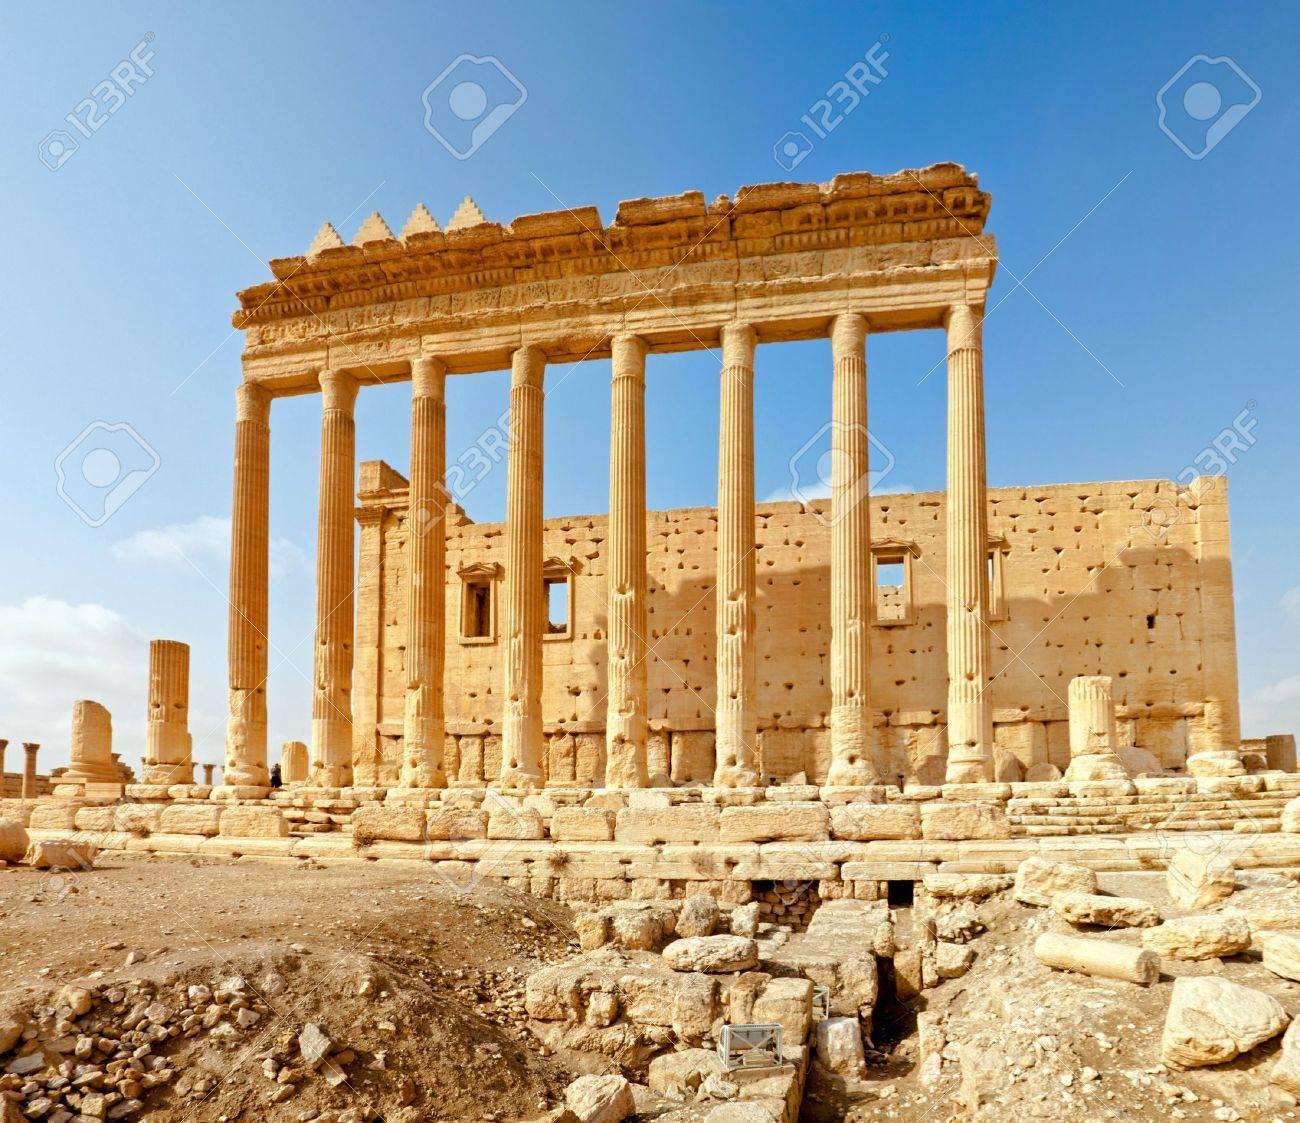 Ancient Roman time town in Palmyra (Tadmor), Syria. Greco-Roman & Persian Period. Temple of Bel. - 6078303